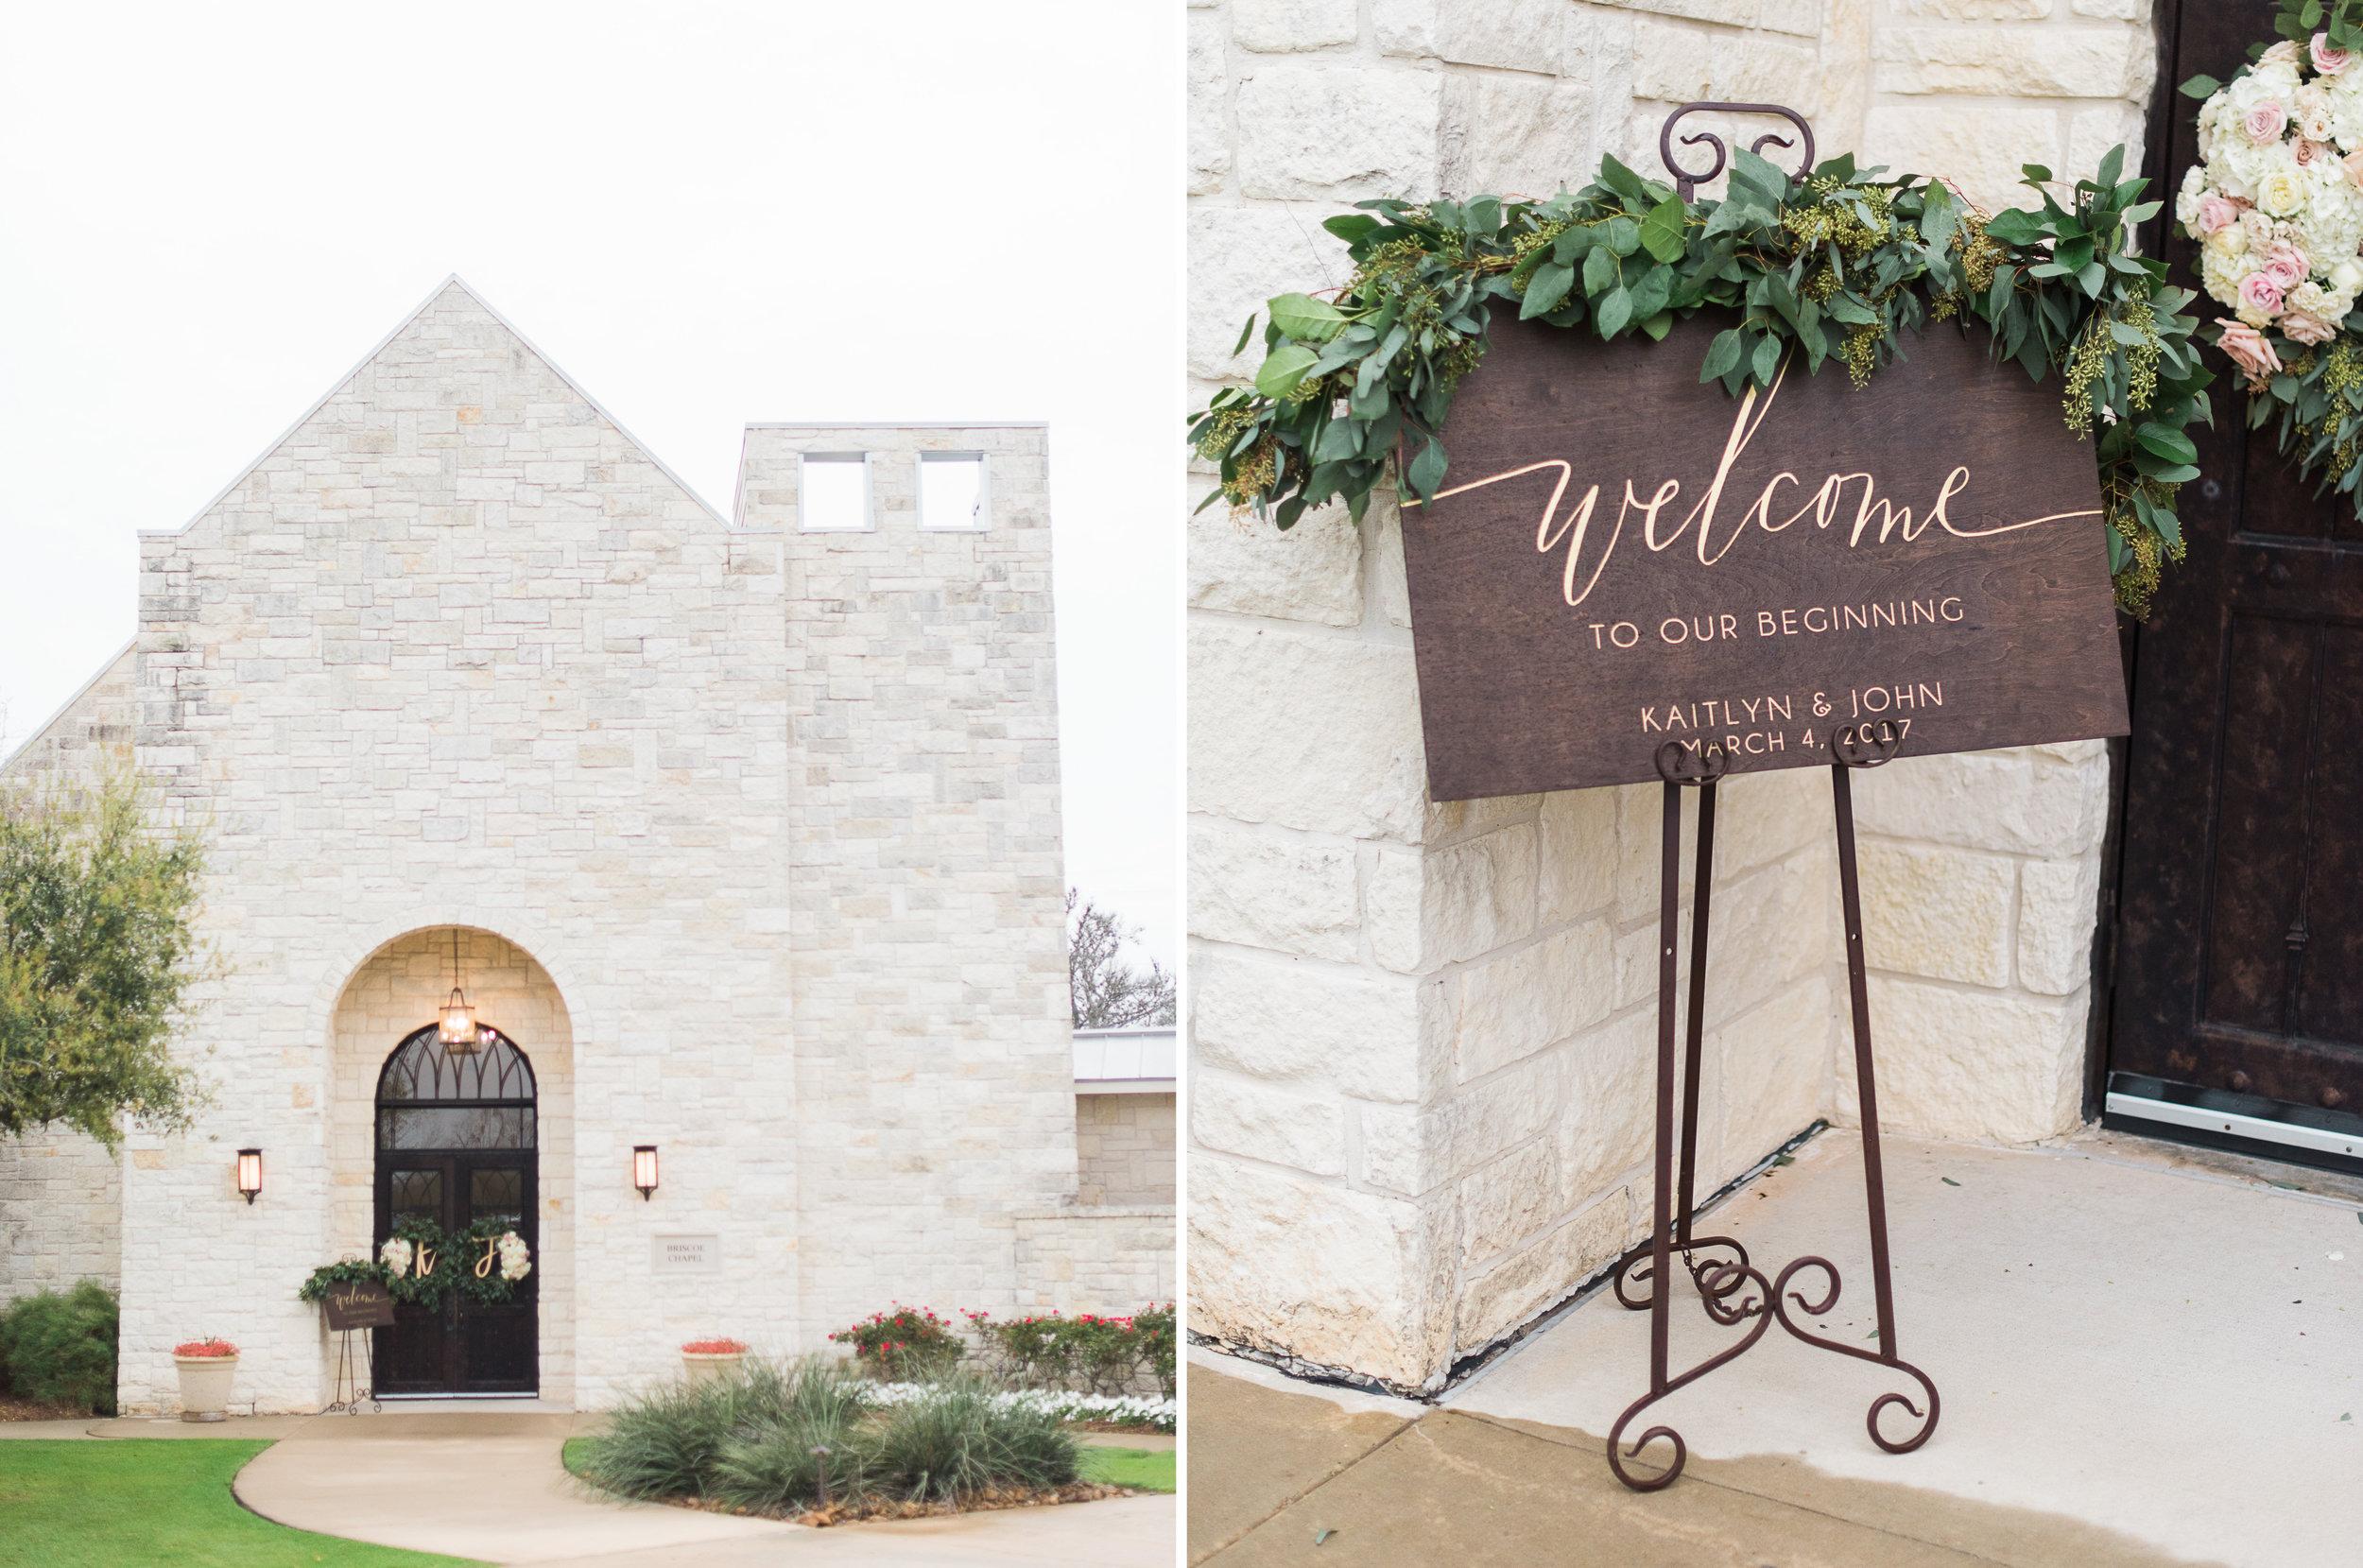 Briscoe-Manor-Houston-Wedding-Photographer-Modern-Luxury-Weddings-Dana-Fernandez-Photograpy-Fine-Art-Photographer-Houston-Film-Destination-PNW-Wedding-Photographer-102.jpg